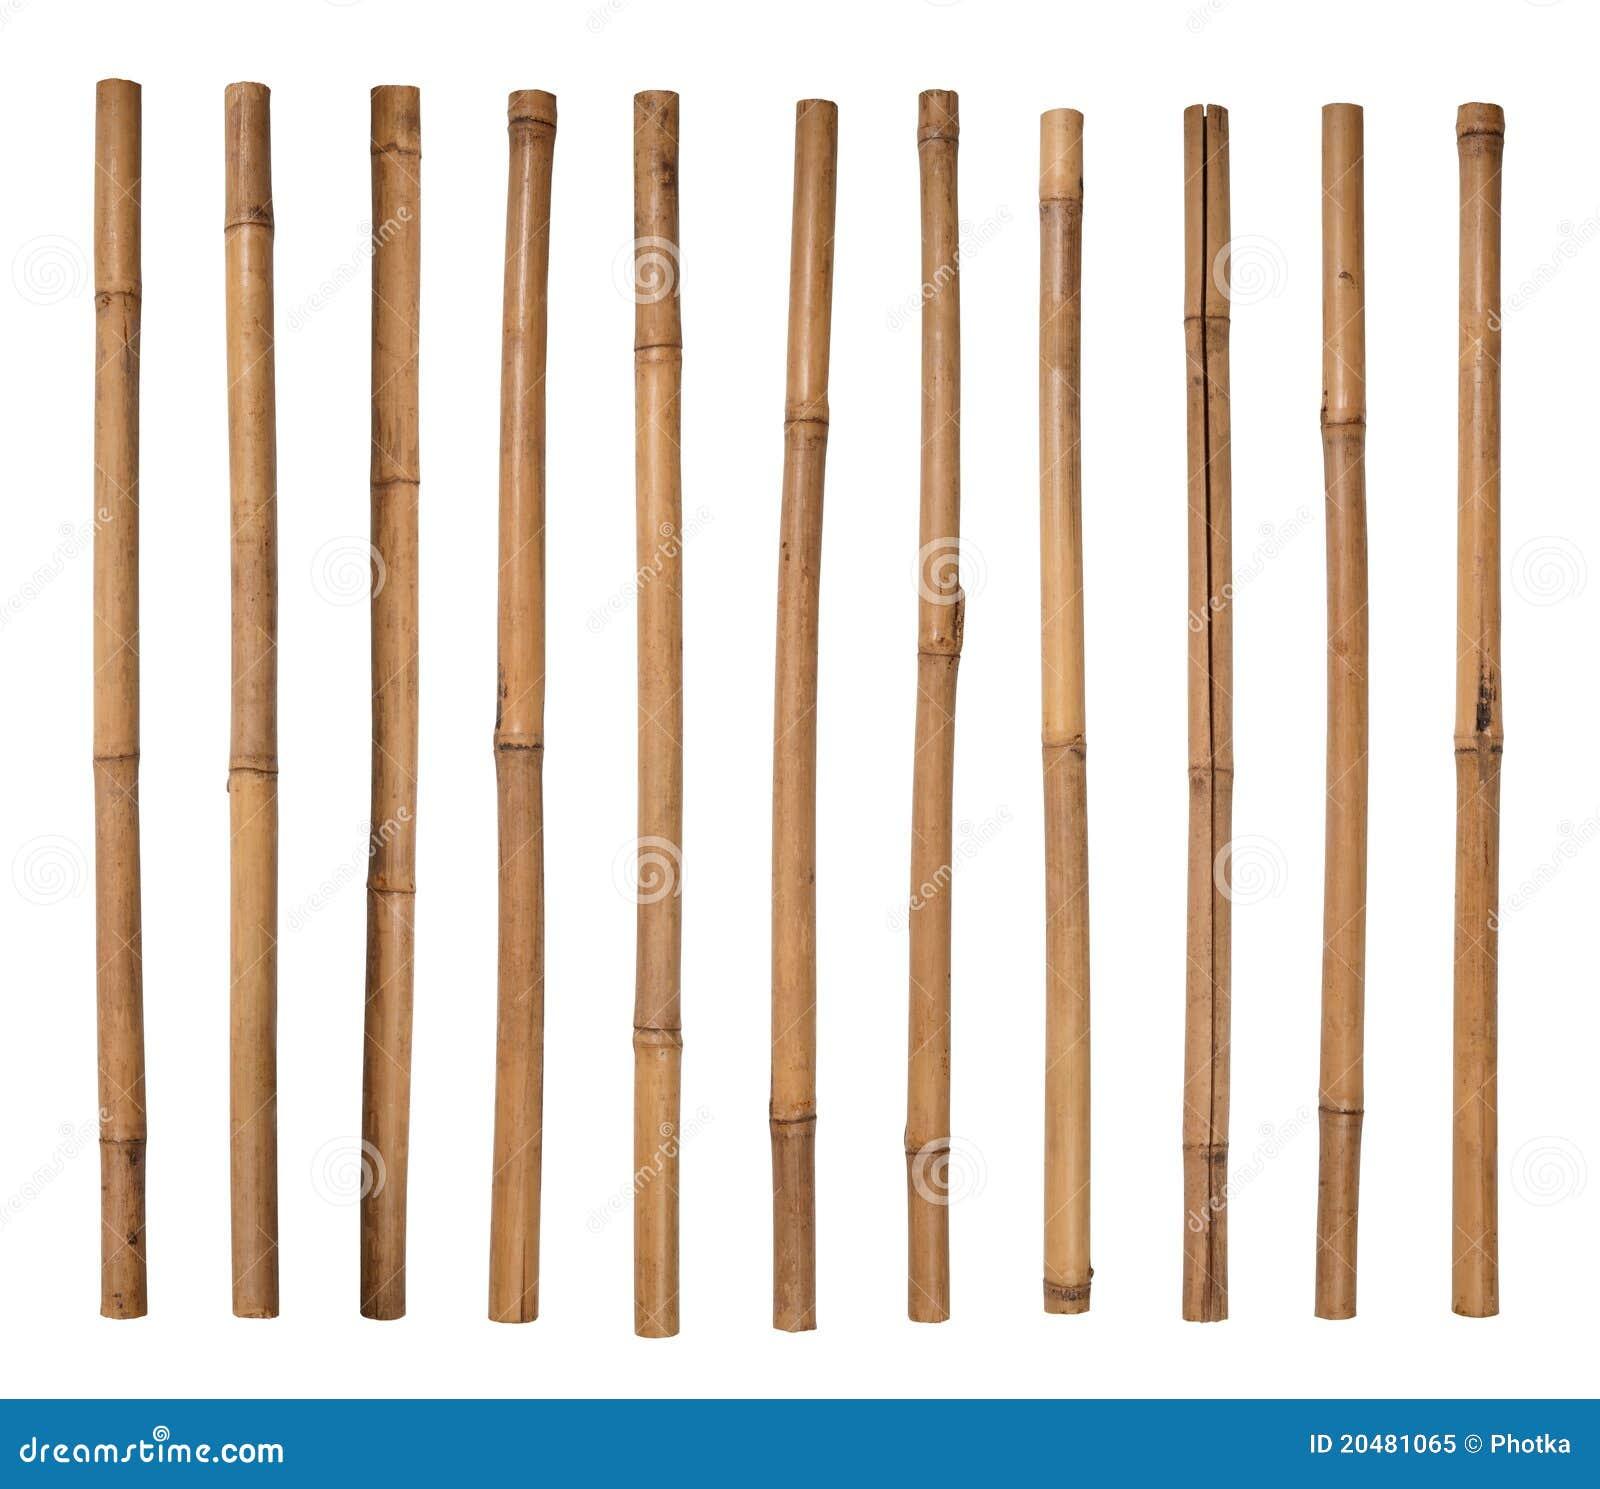 Bamboo dating